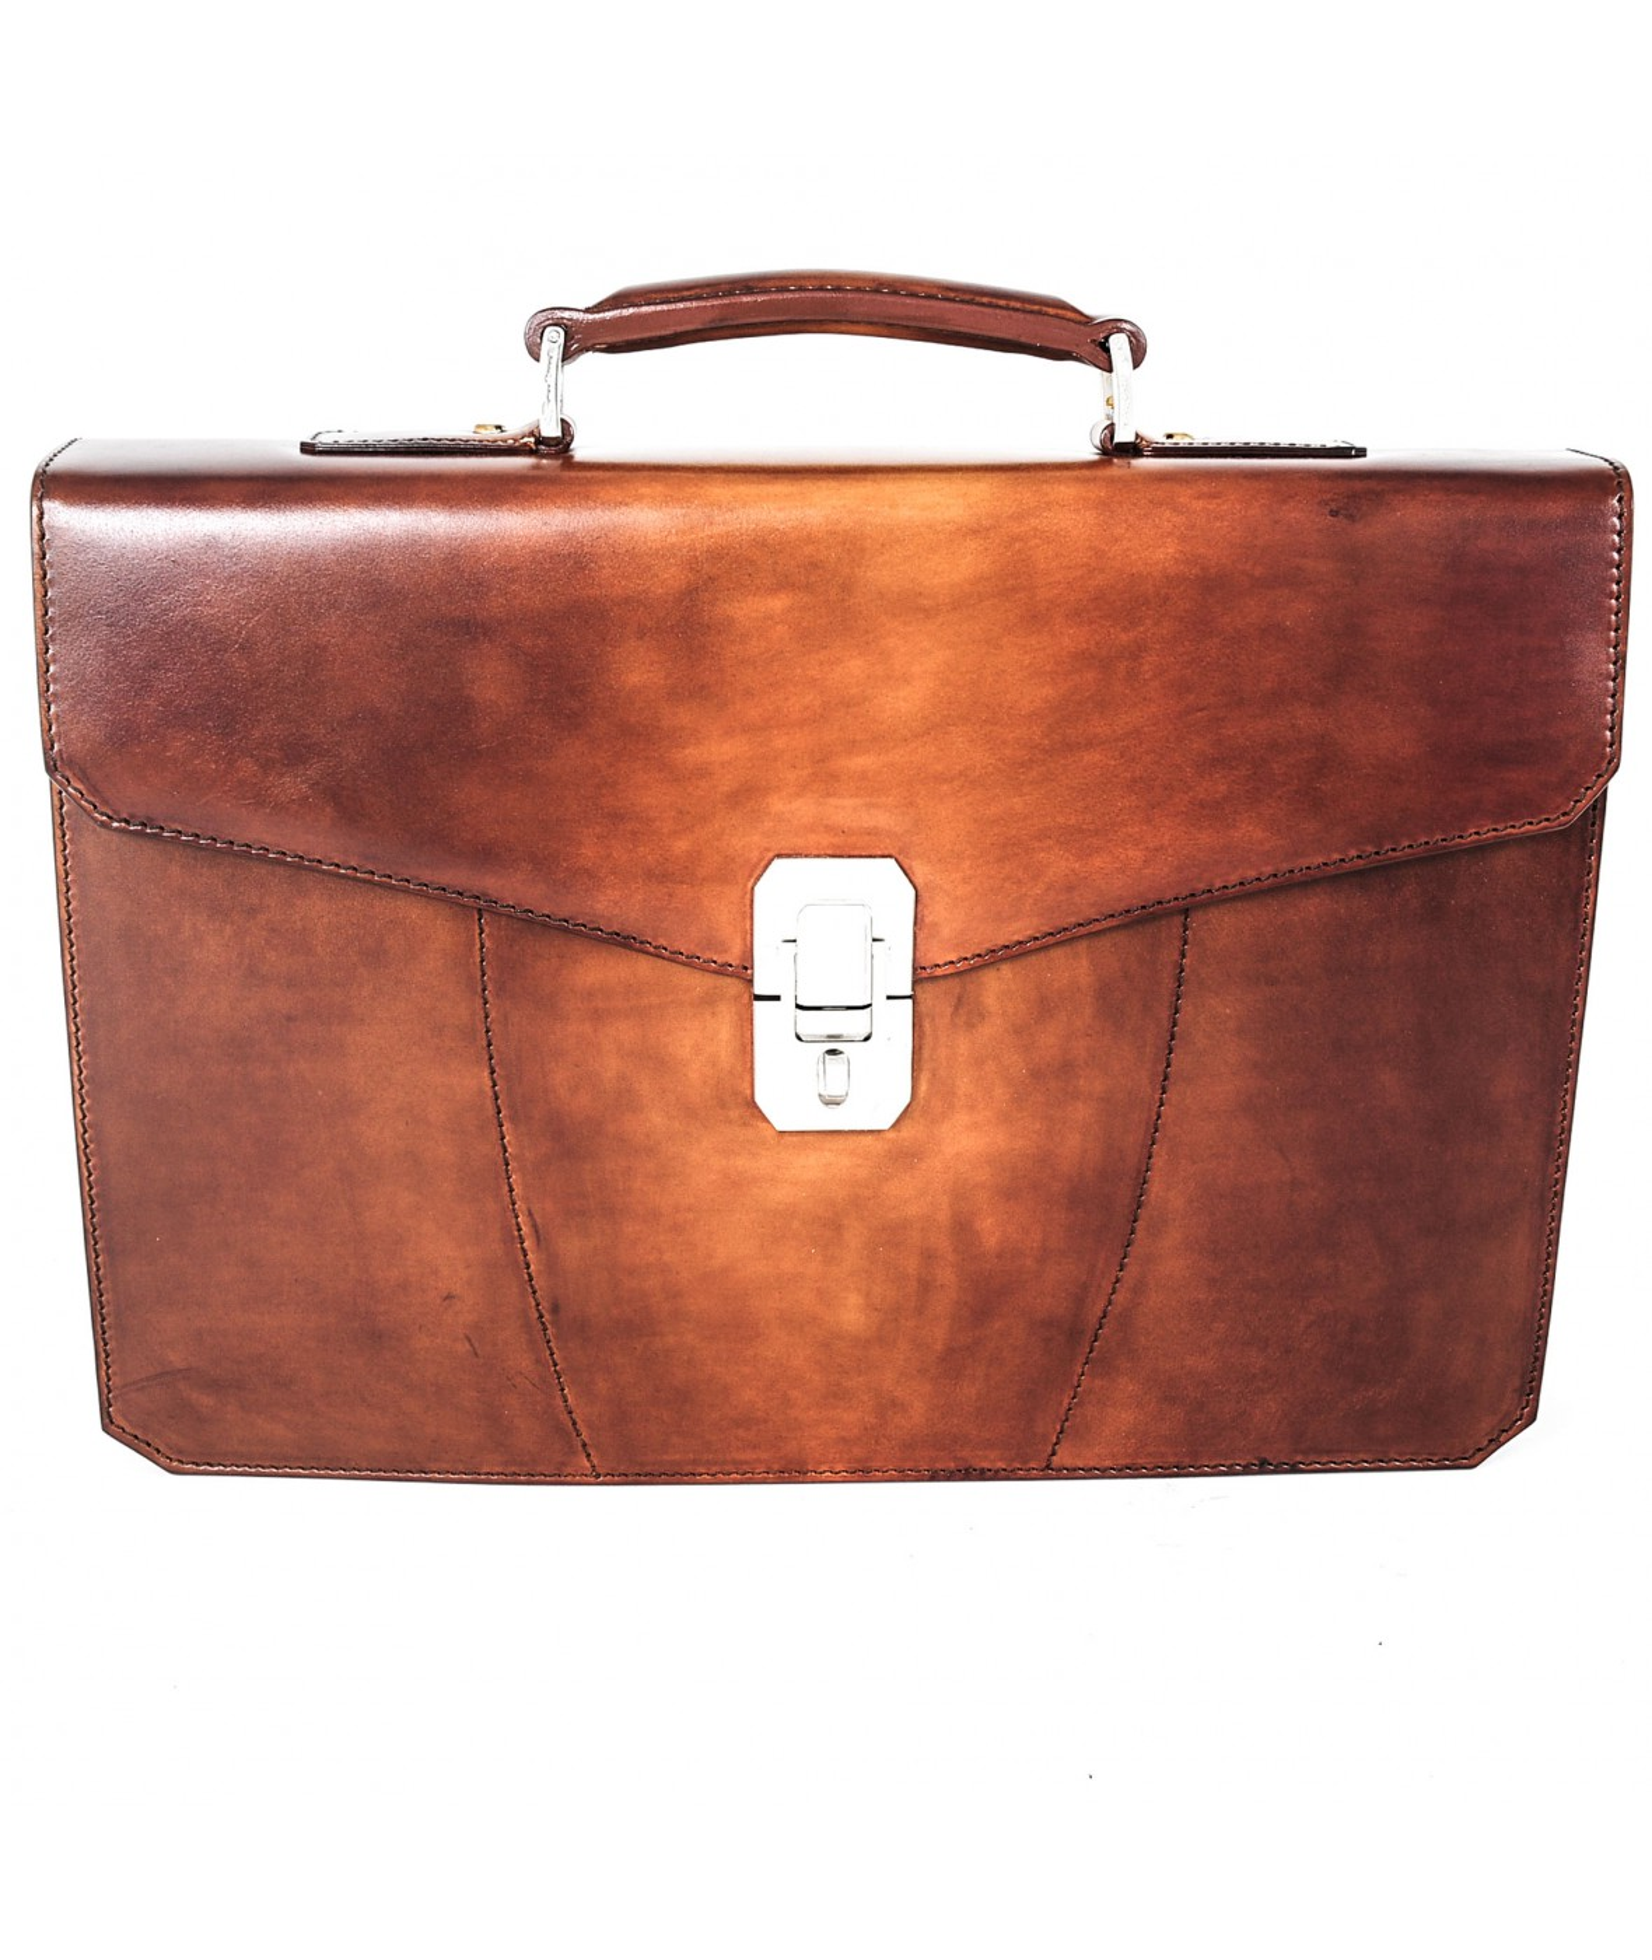 Santoni Office Bag Cognac (27810)